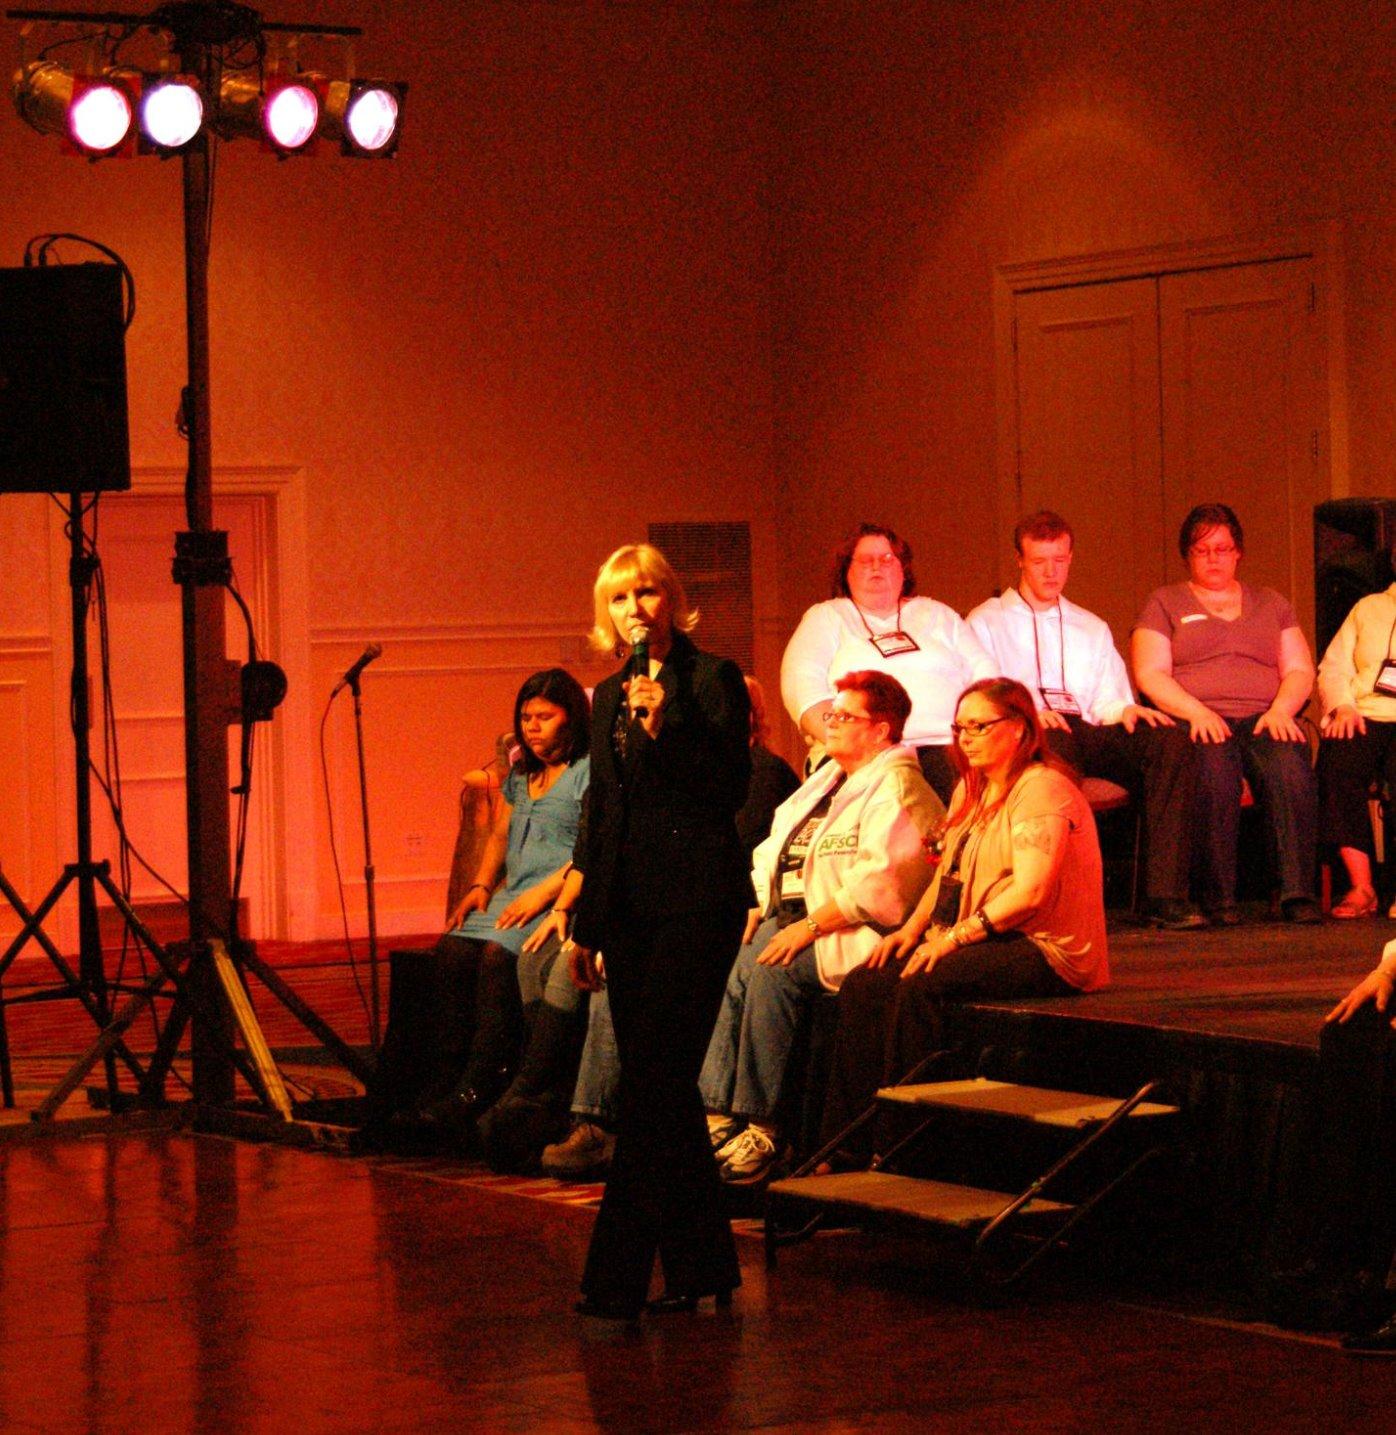 Laura Amoroso Corp Hypnosis Show